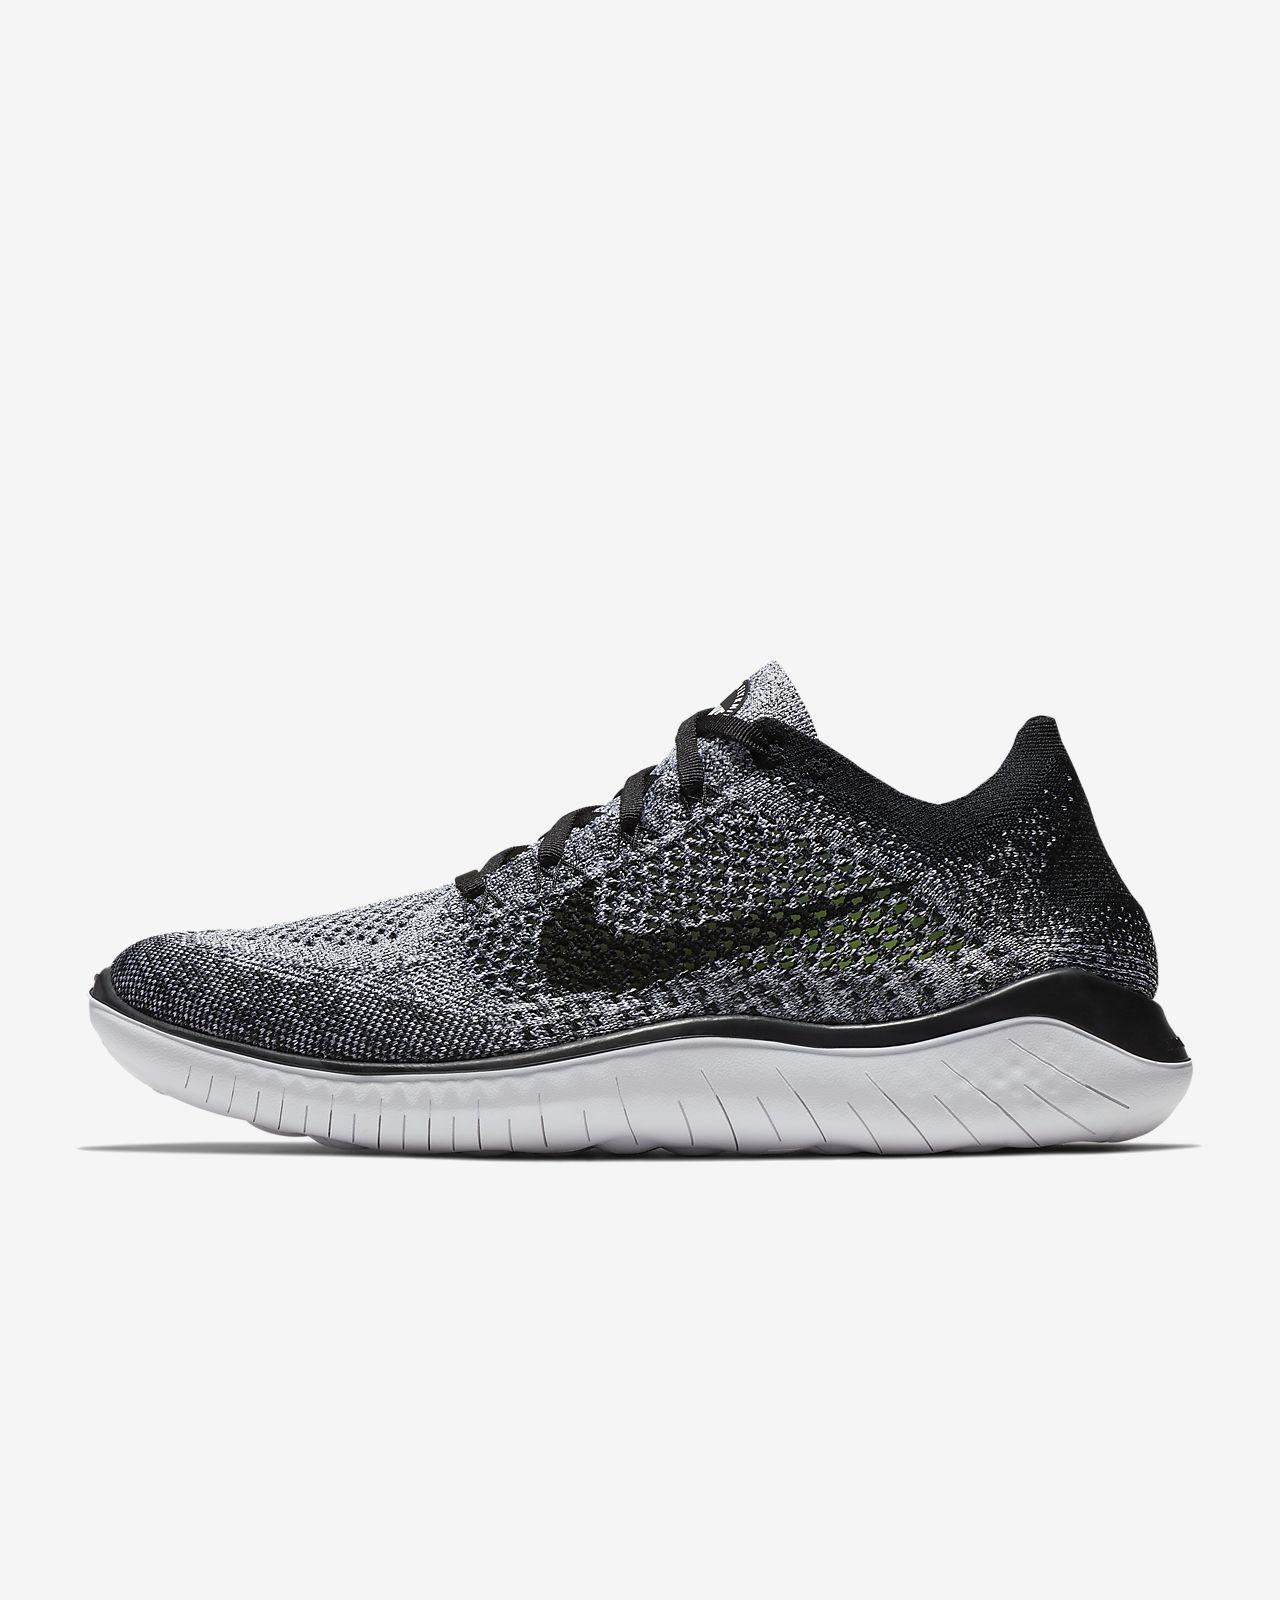 cbe4eed3787f Nike Free RN Flyknit 2018 Men s Running Shoe. Nike.com SI